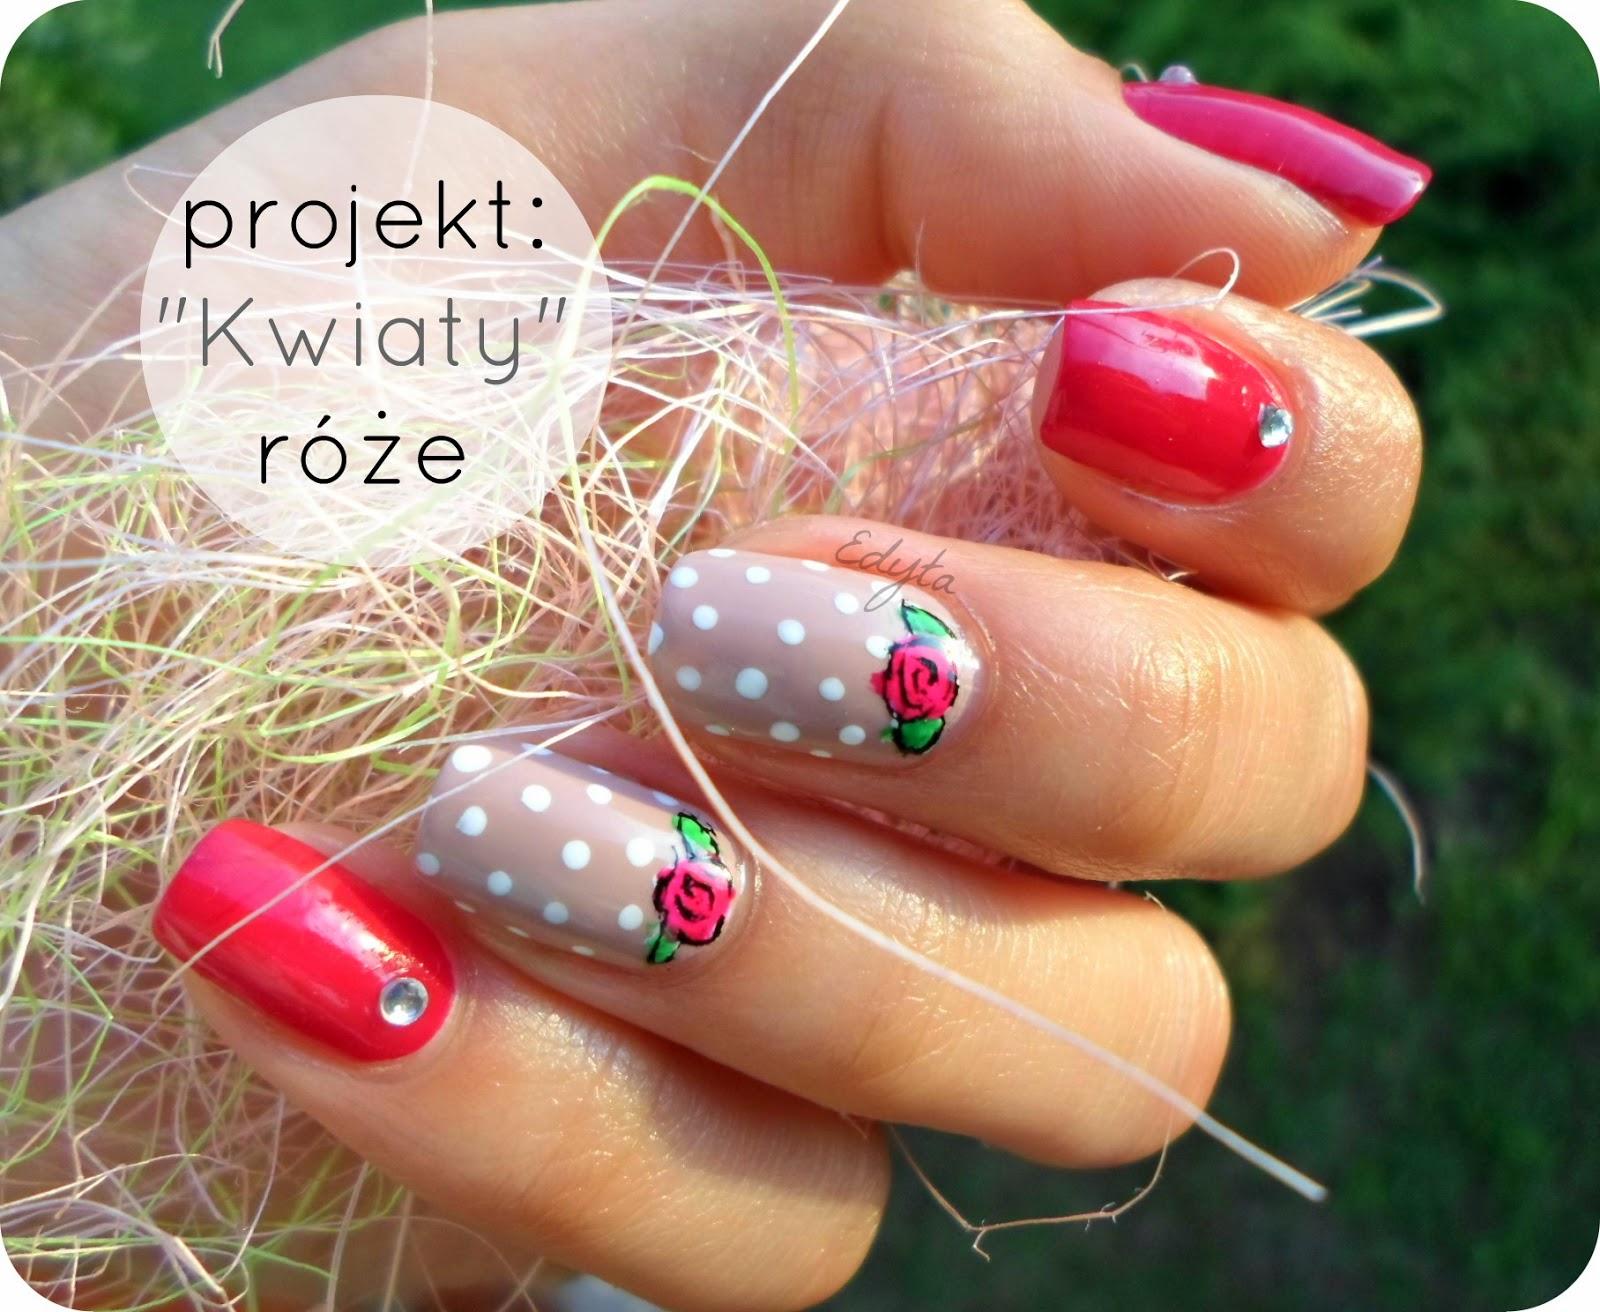 http://nailsandmore2.blogspot.com/2014/07/kwiaty-roza.html